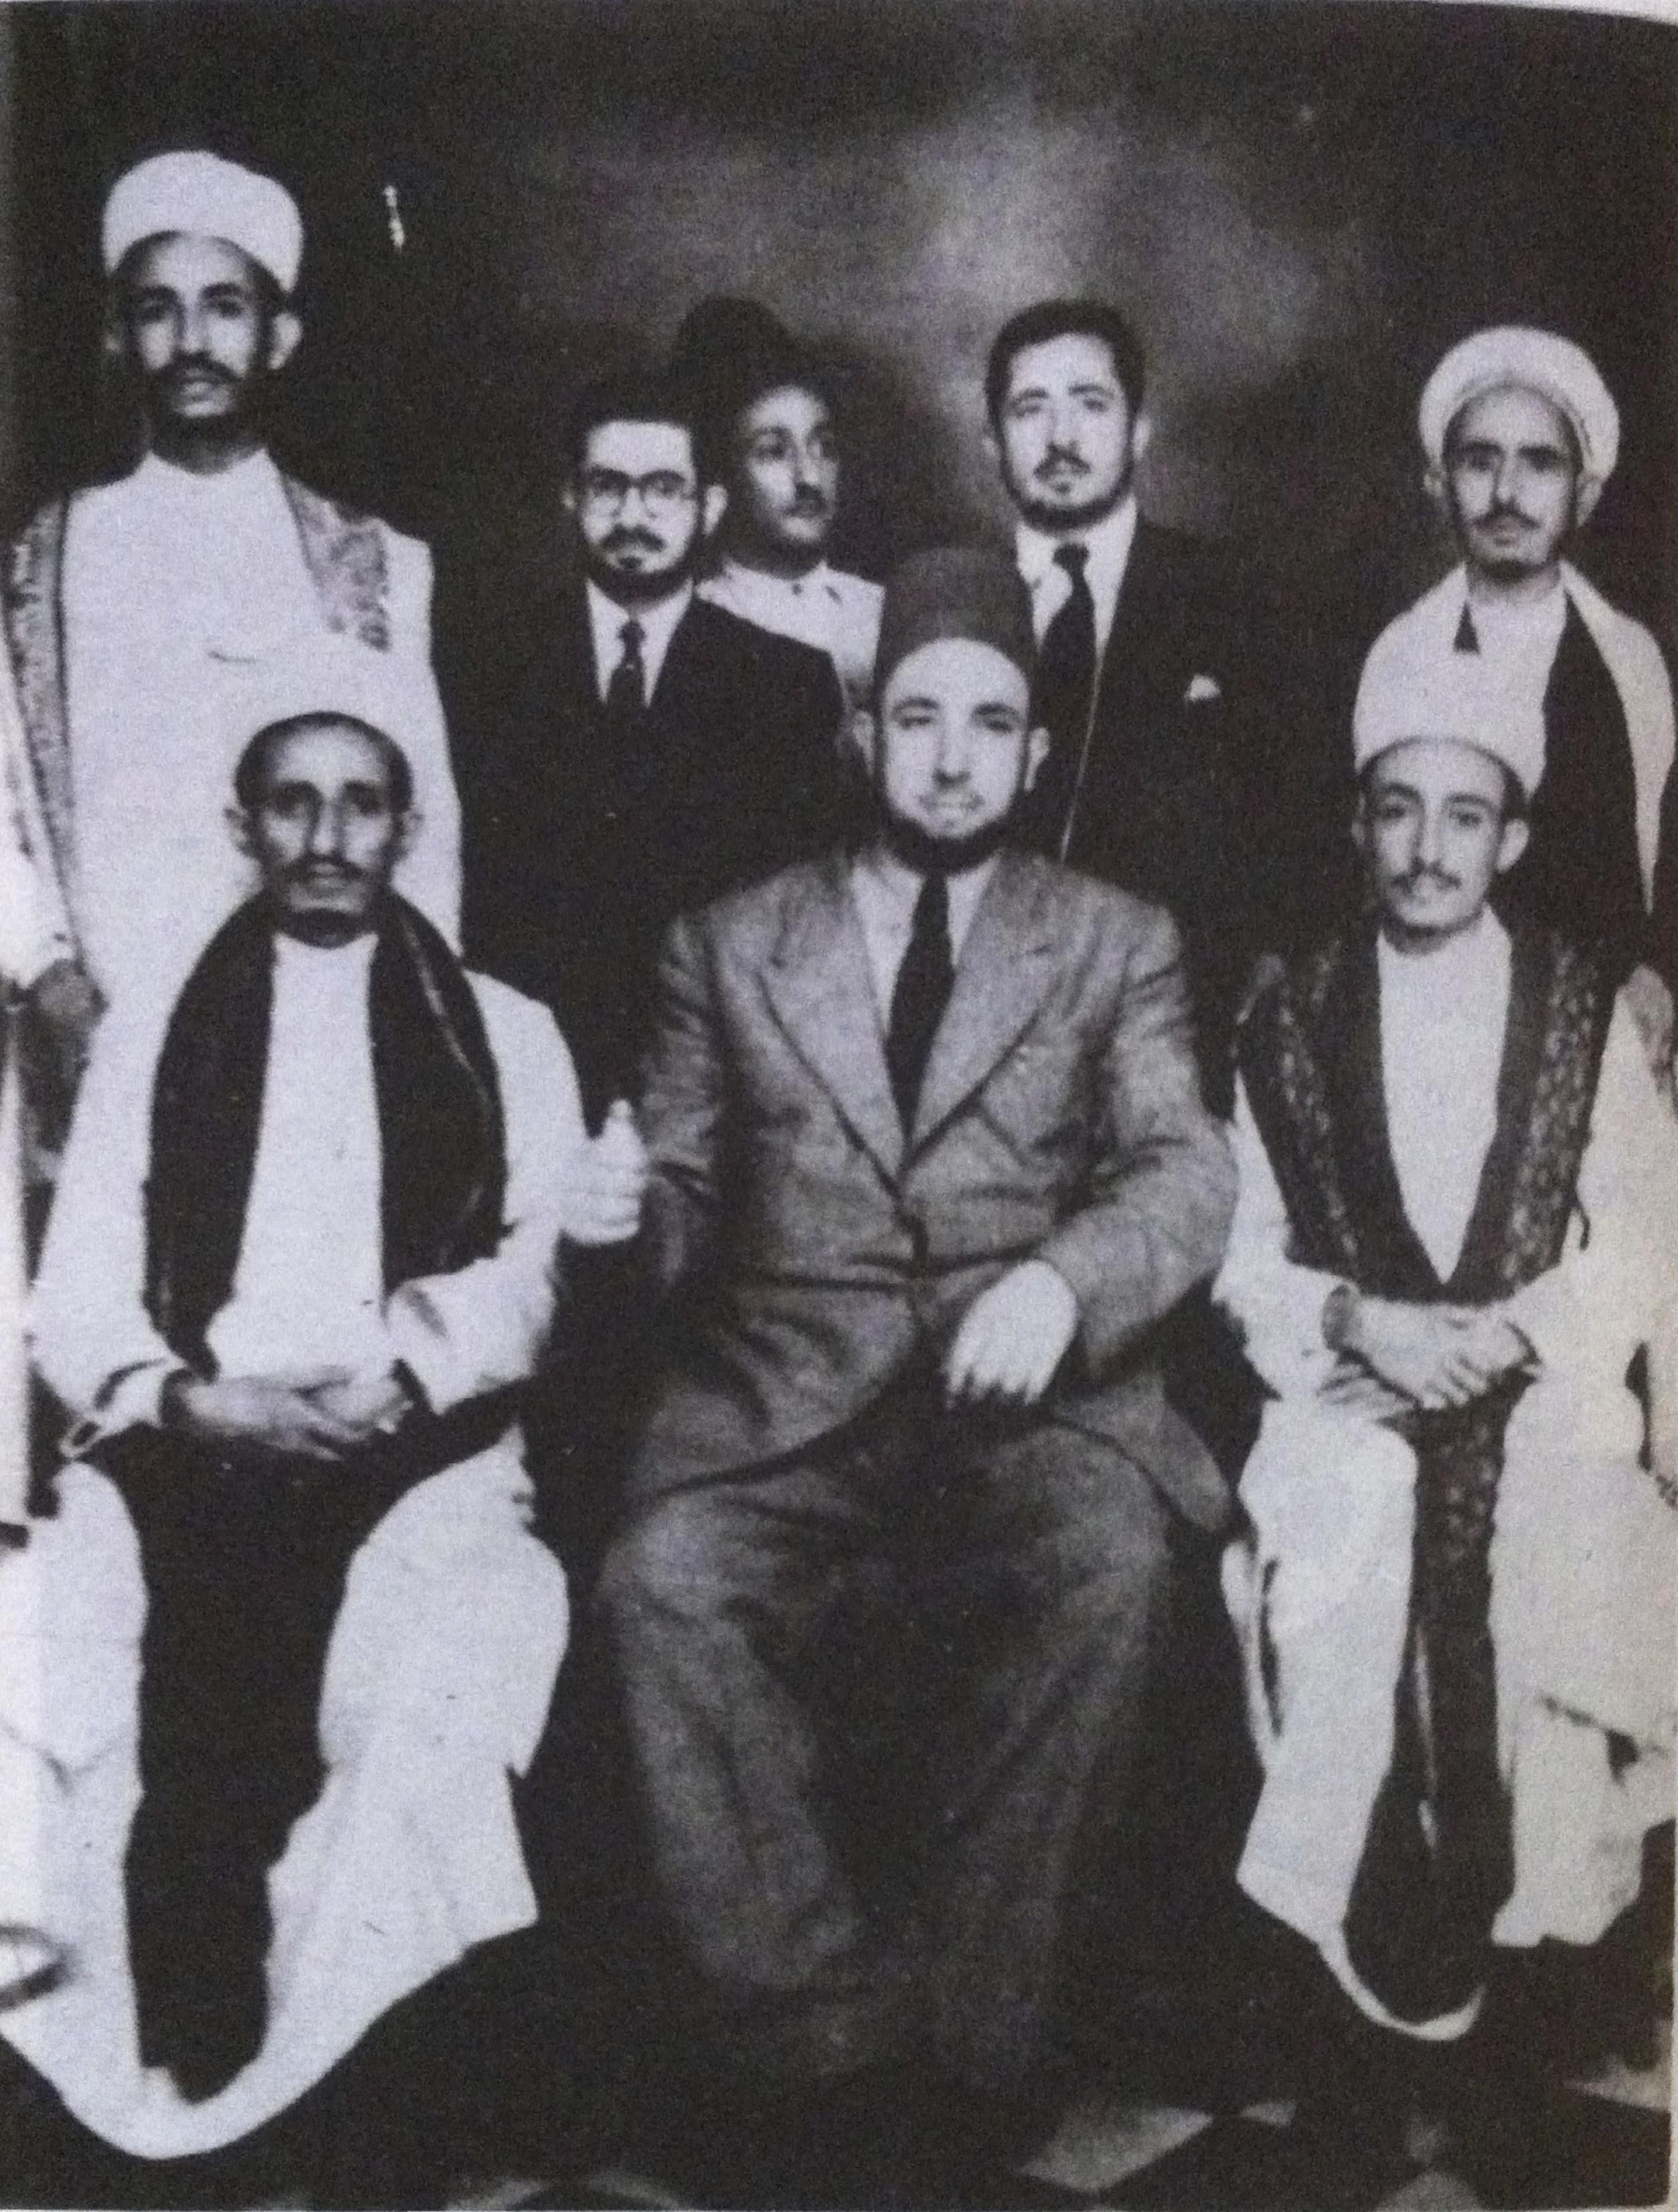 Front row from the right: Hussein Ben Ali Al-Waisi, Al Fadheel Al Wartlani and Abdullah Al Iryani  Back row from left: Mohammed Al Emad, Mohiye AlDin Al 'Ansi, Ahmed Al Horesh, and Zayed Al Al-Moushki  Last row: Ahmed Abdo Nasher *